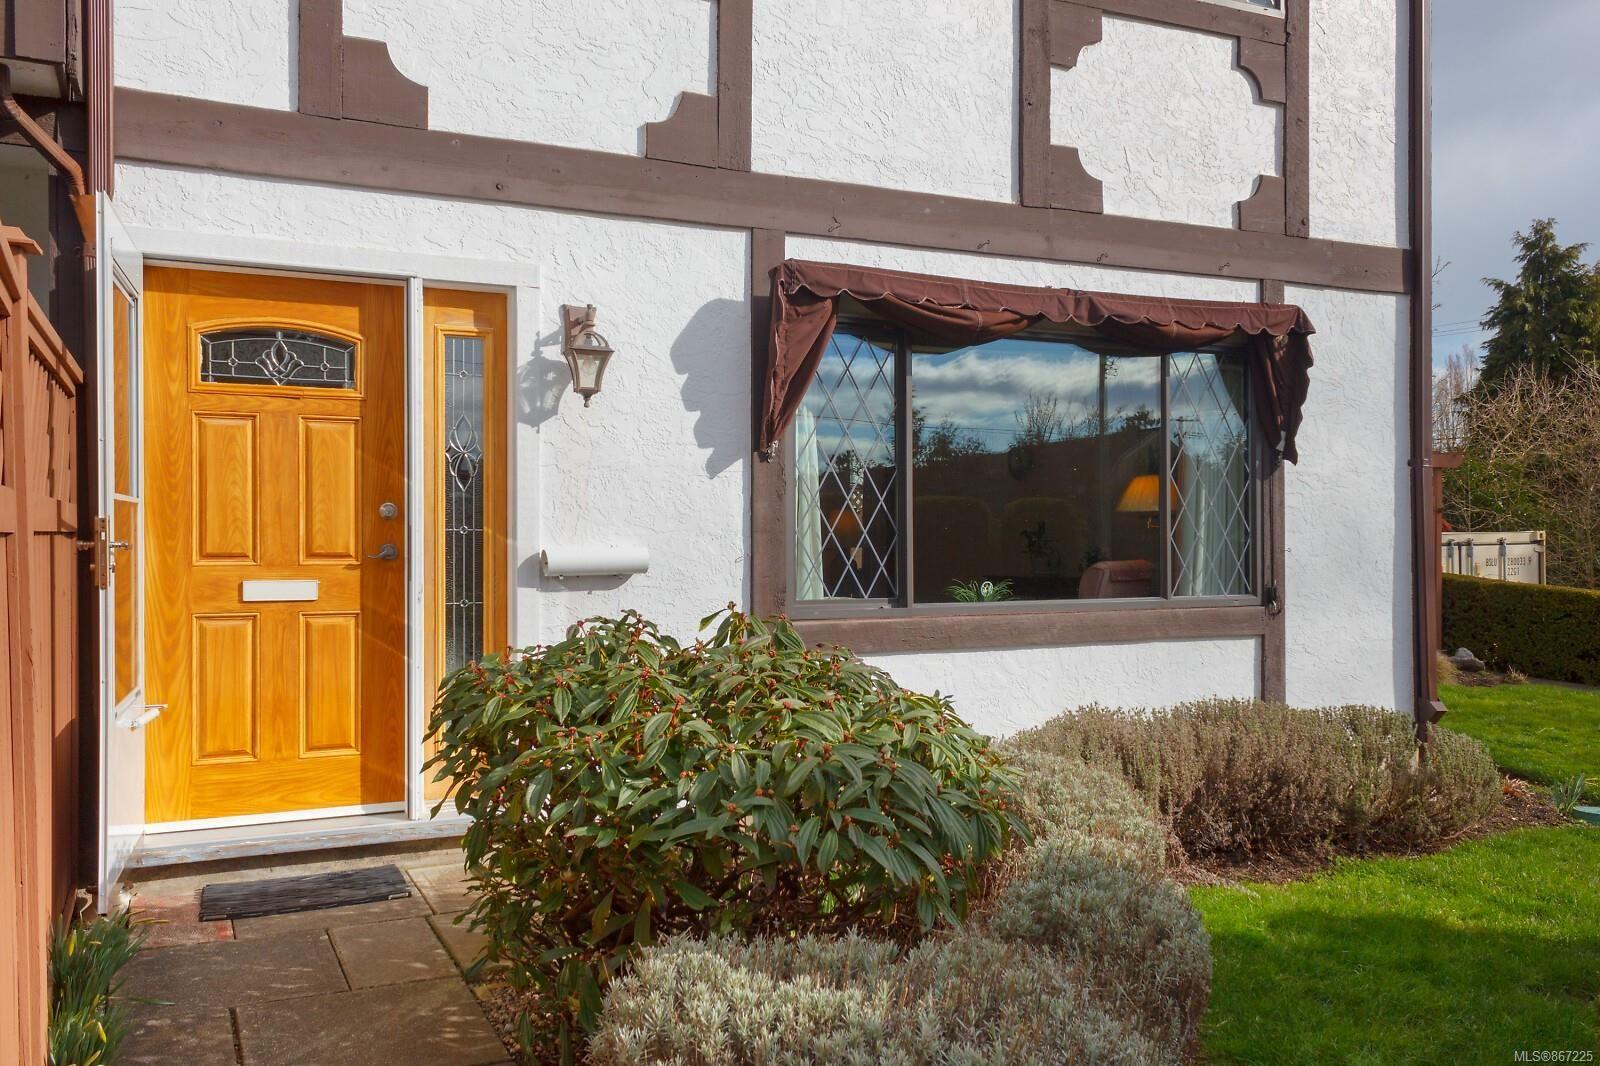 Main Photo: 3 3211 Shelley St in : SE Cedar Hill Row/Townhouse for sale (Saanich East)  : MLS®# 867225